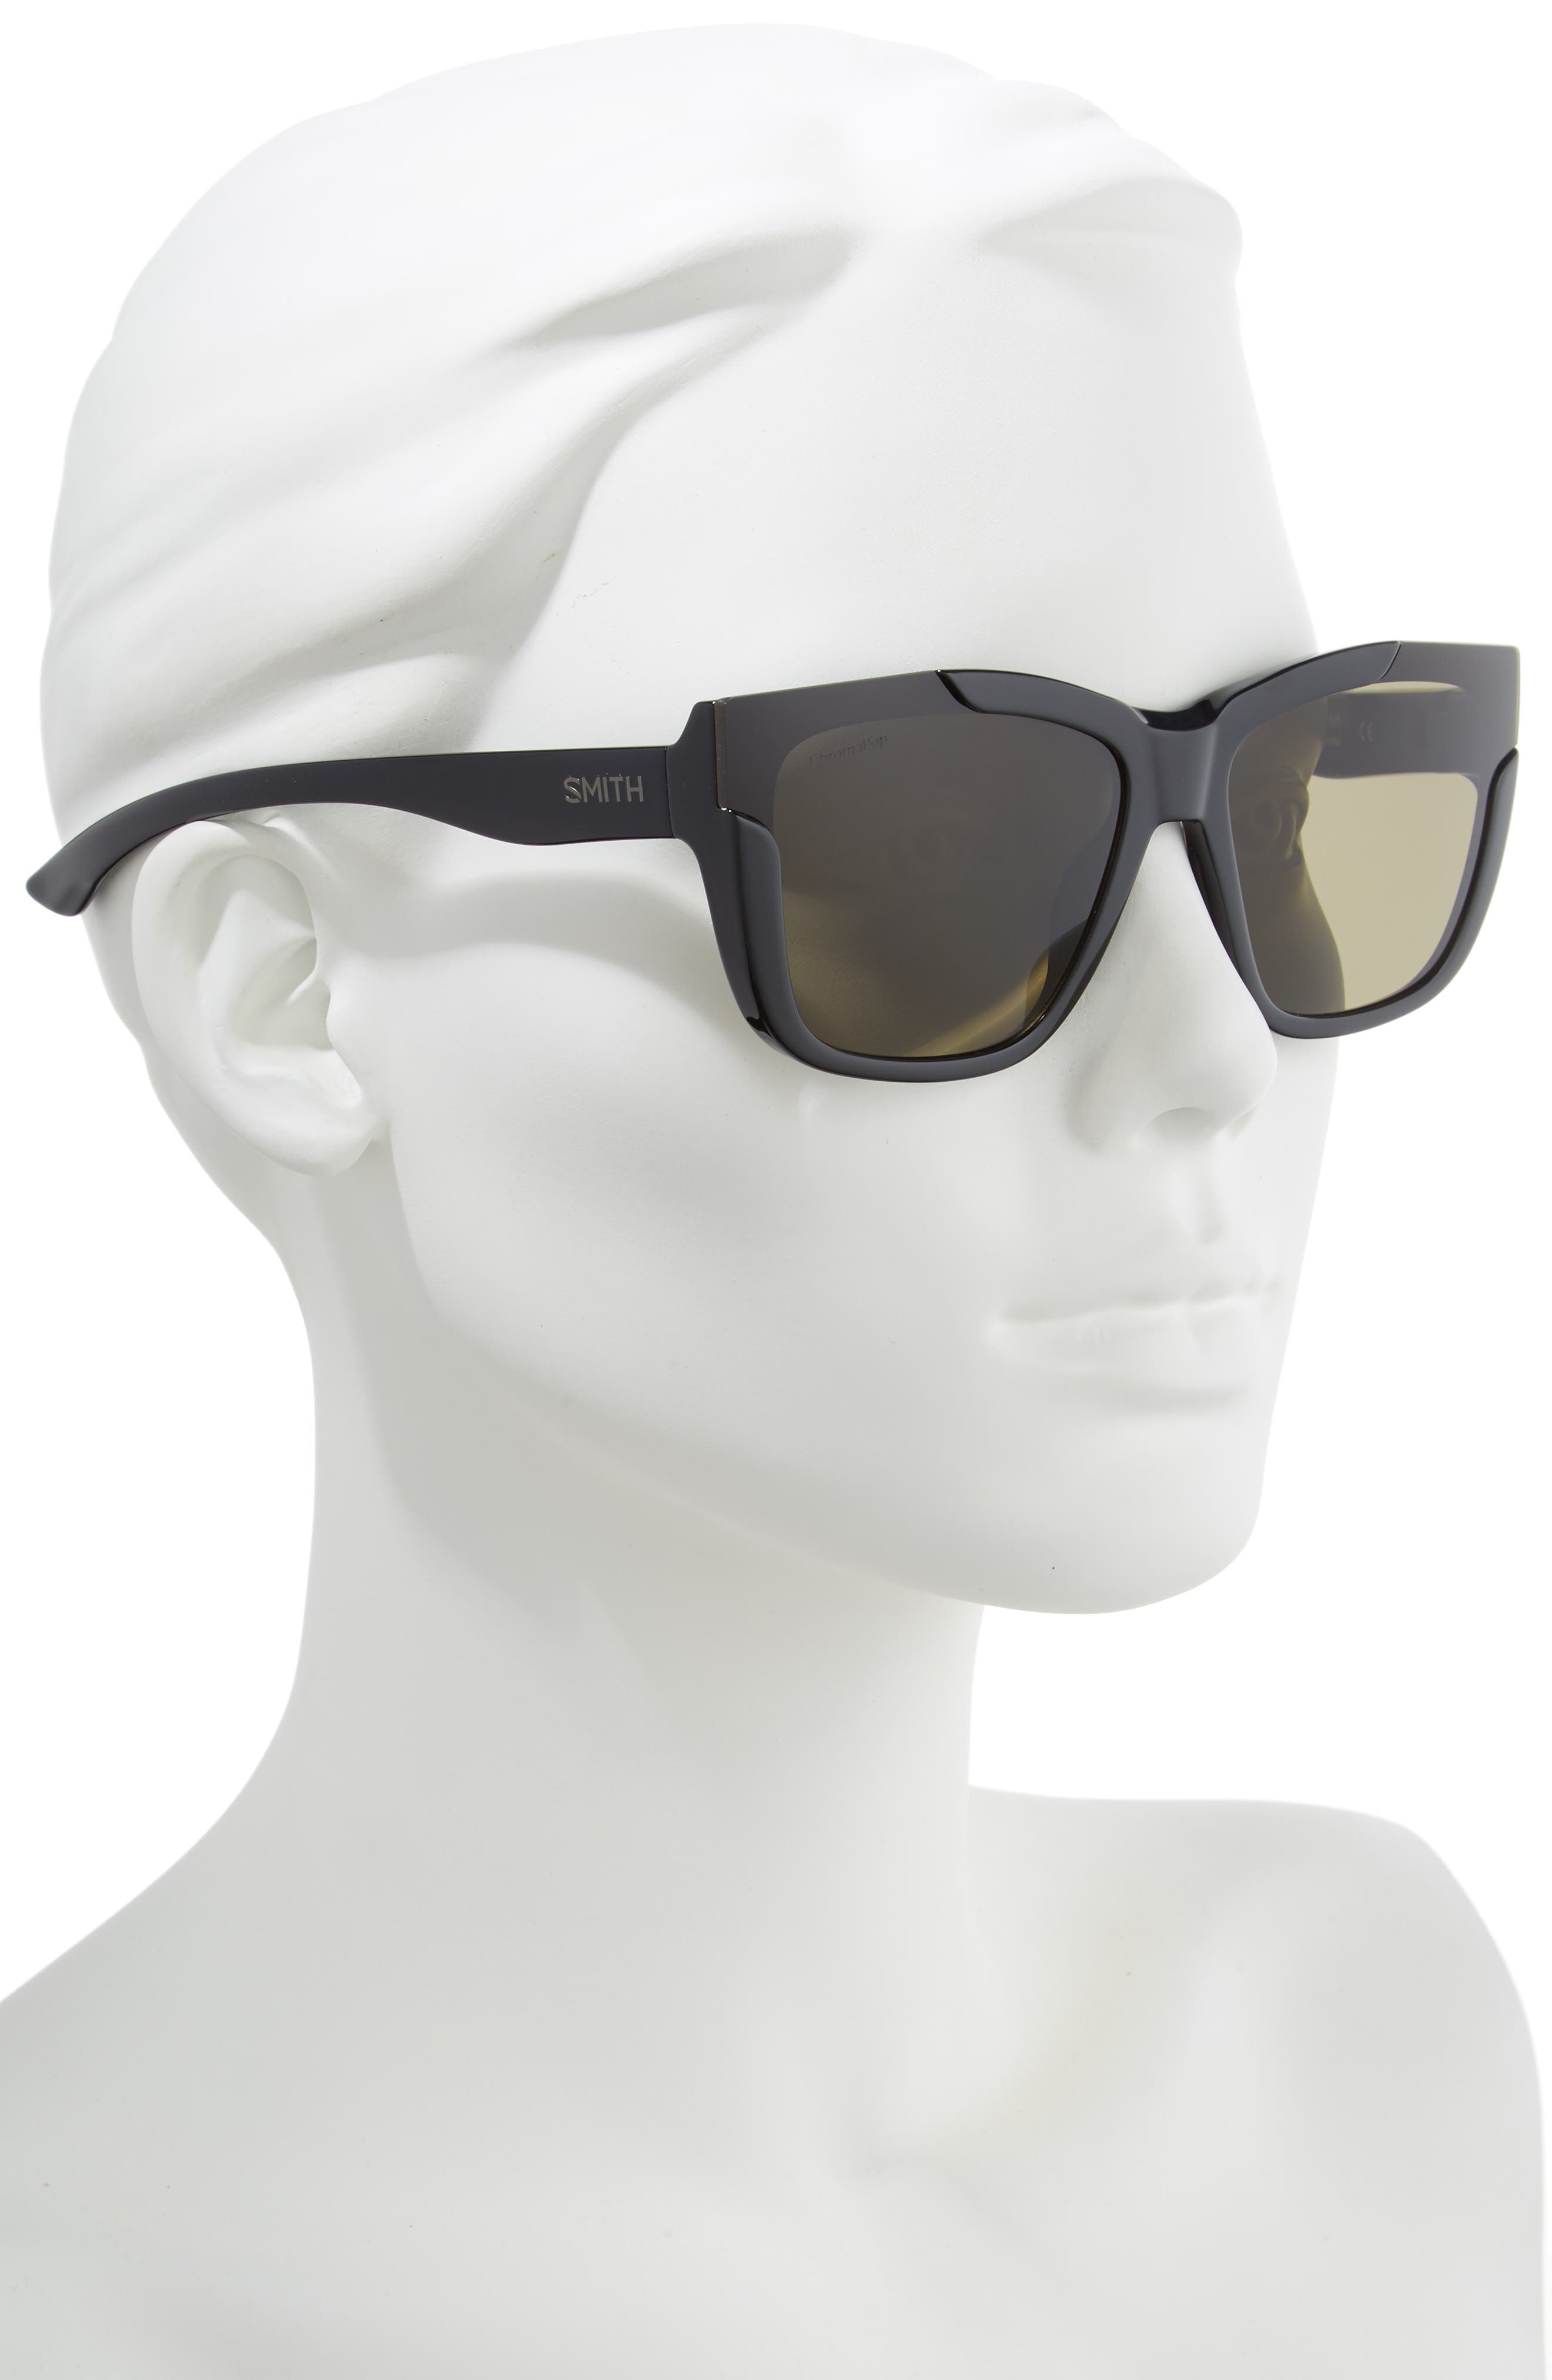 Dreamline 62mm Oversize Butterfly ChromaPop<sup>™</sup> Polarized Sunglasses,                             Alternate thumbnail 2, color,                             BLACK